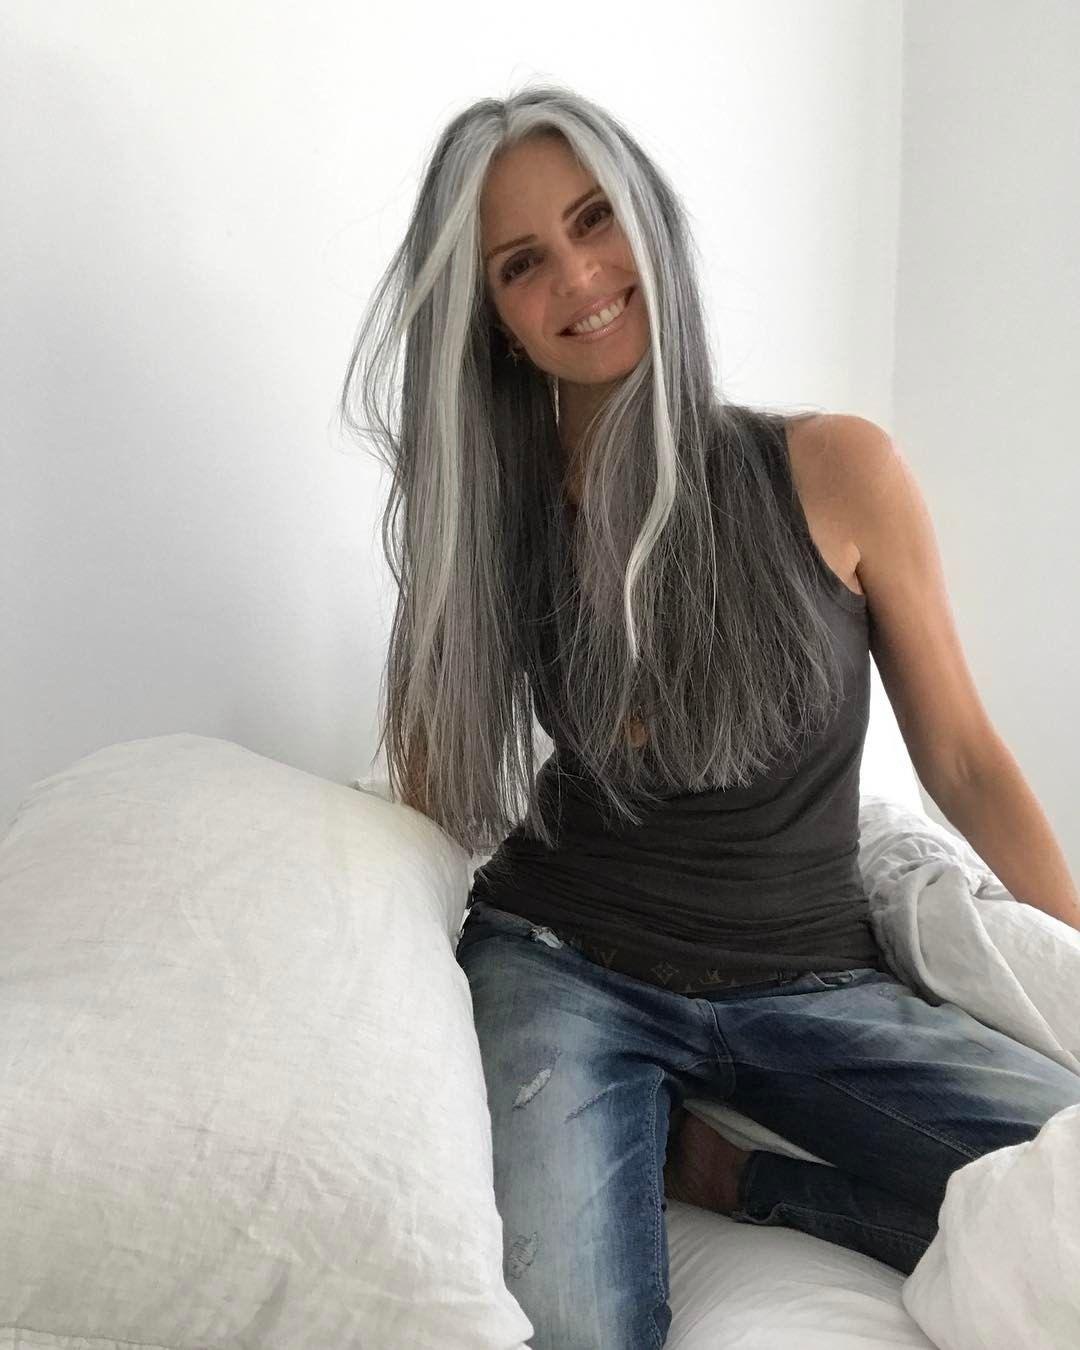 Cheap Boutique Clothing Long Gray Hair Silver Grey Hair